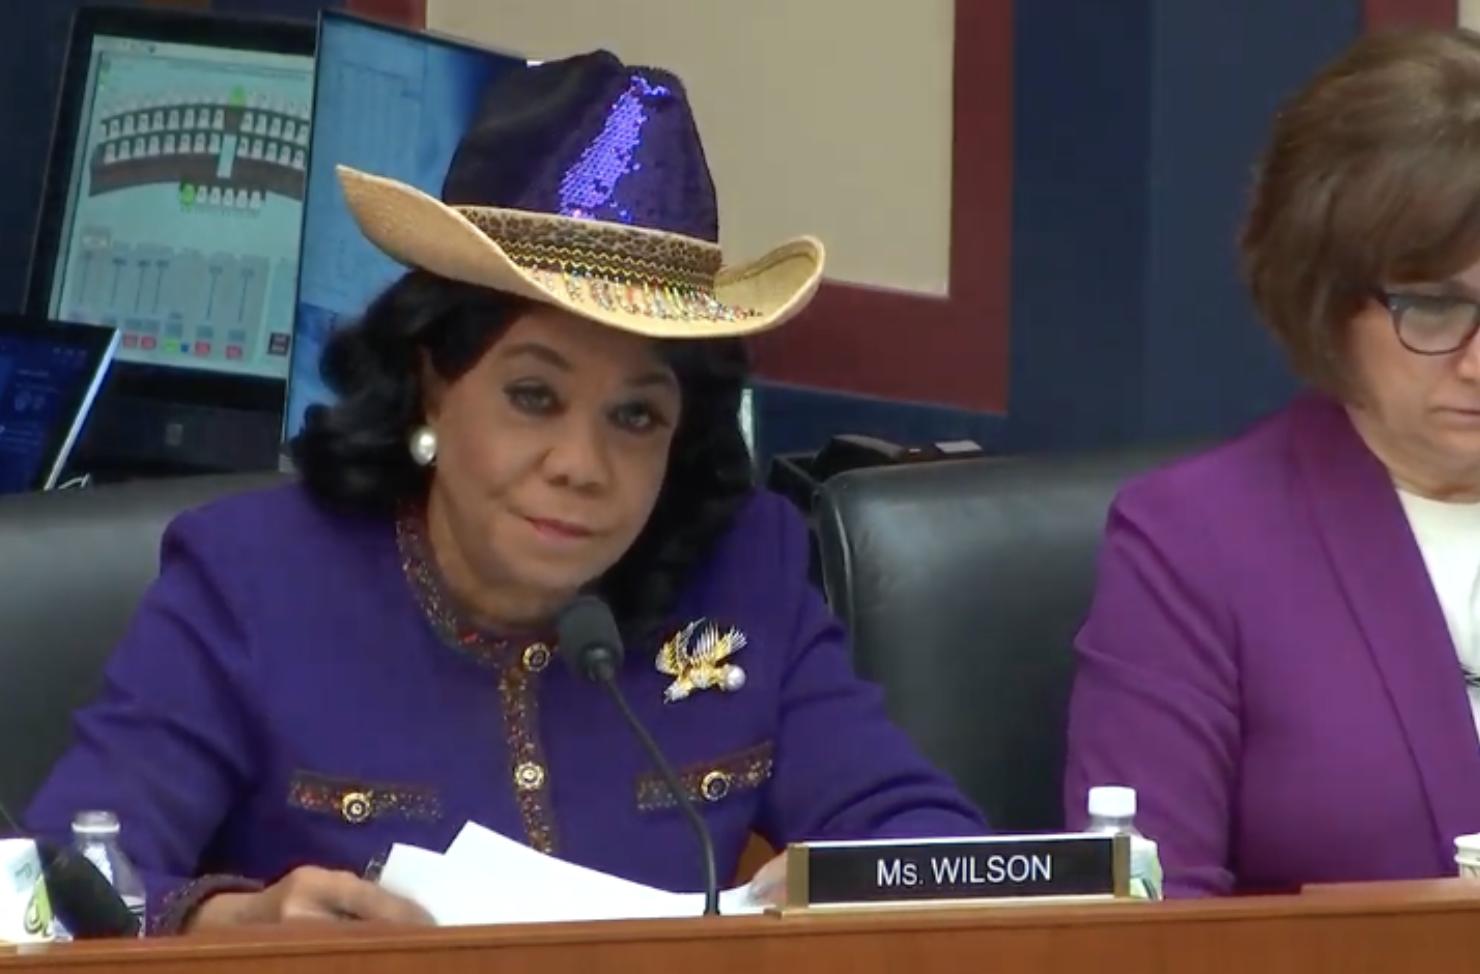 Rep. Frederica Wilson (D-FL) speaks during a hearing on December 12, 2019. (Screenshot/YouTube)